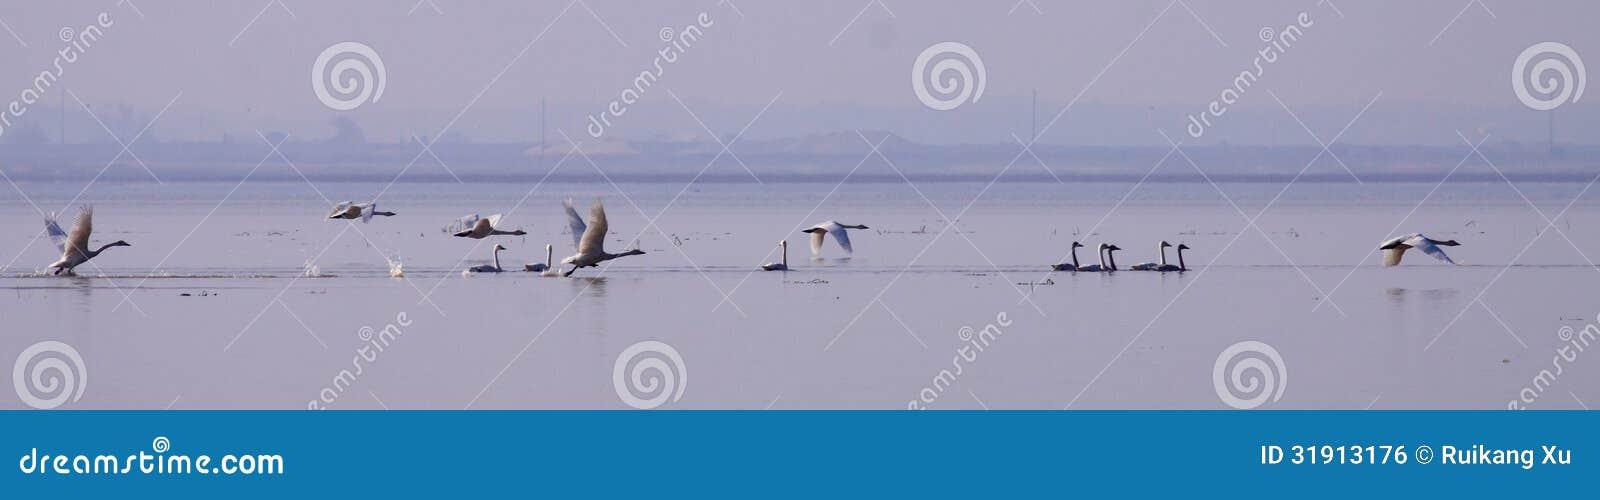 essay on swan